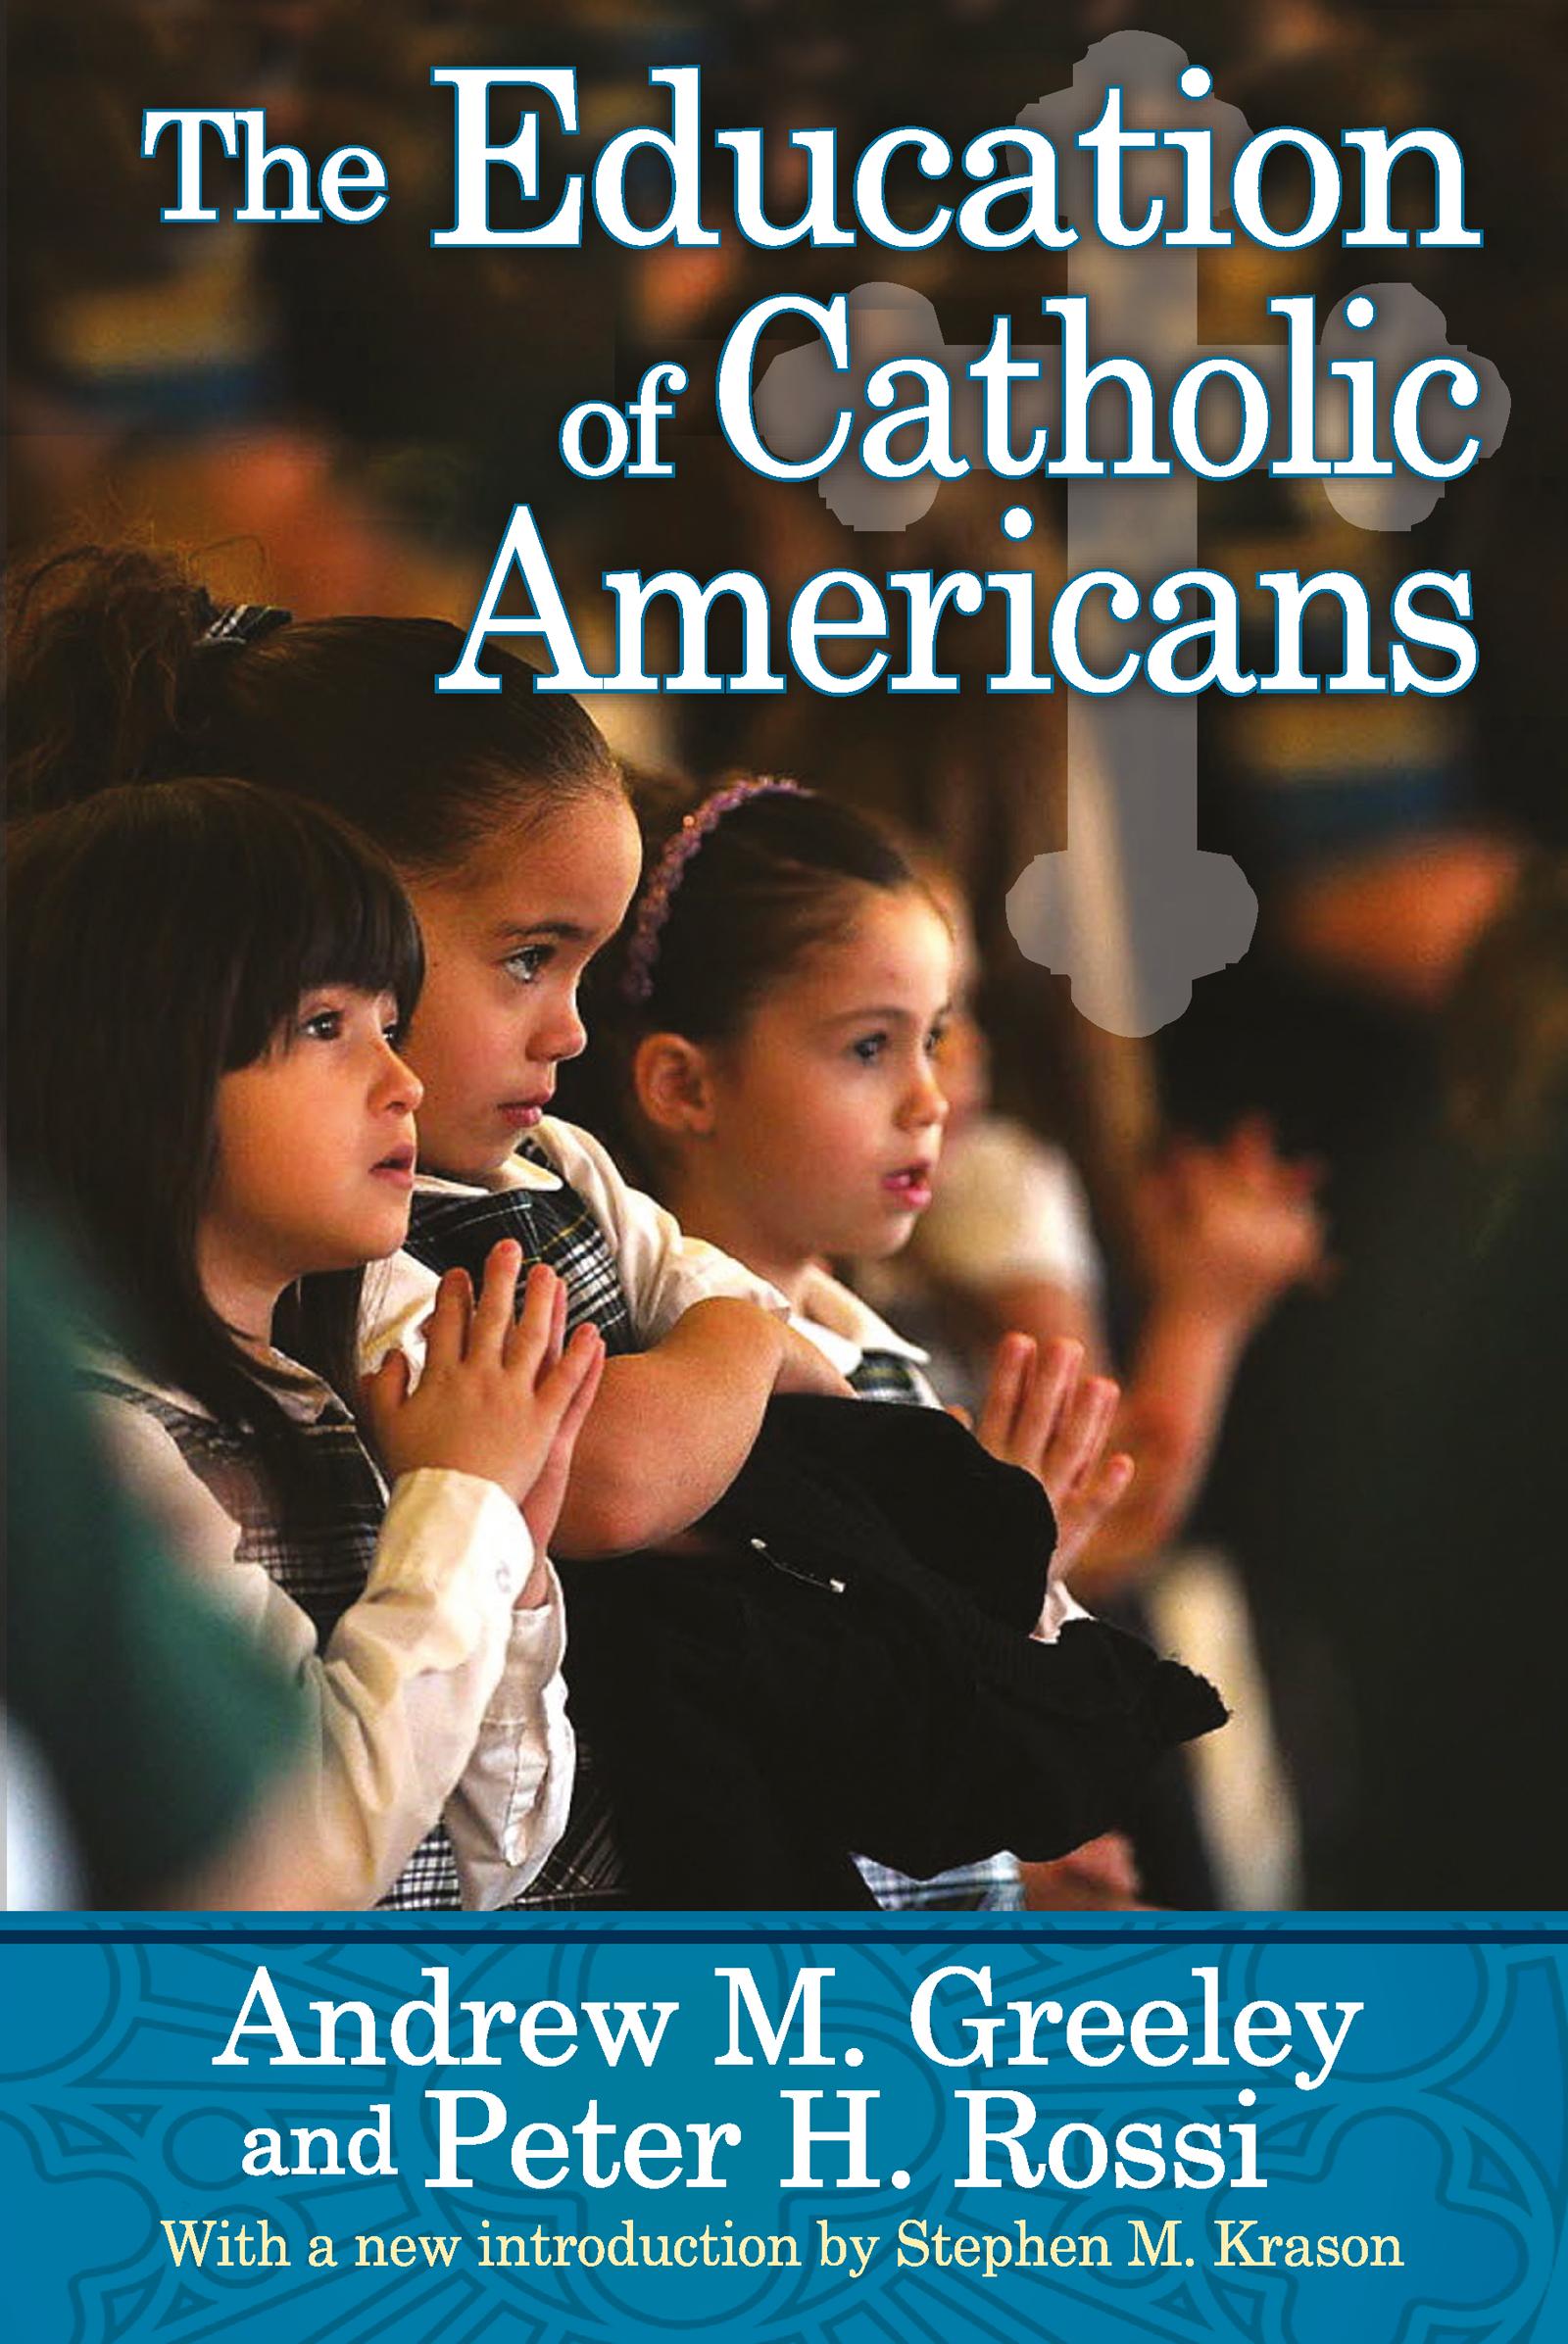 The Education of Catholic Americans